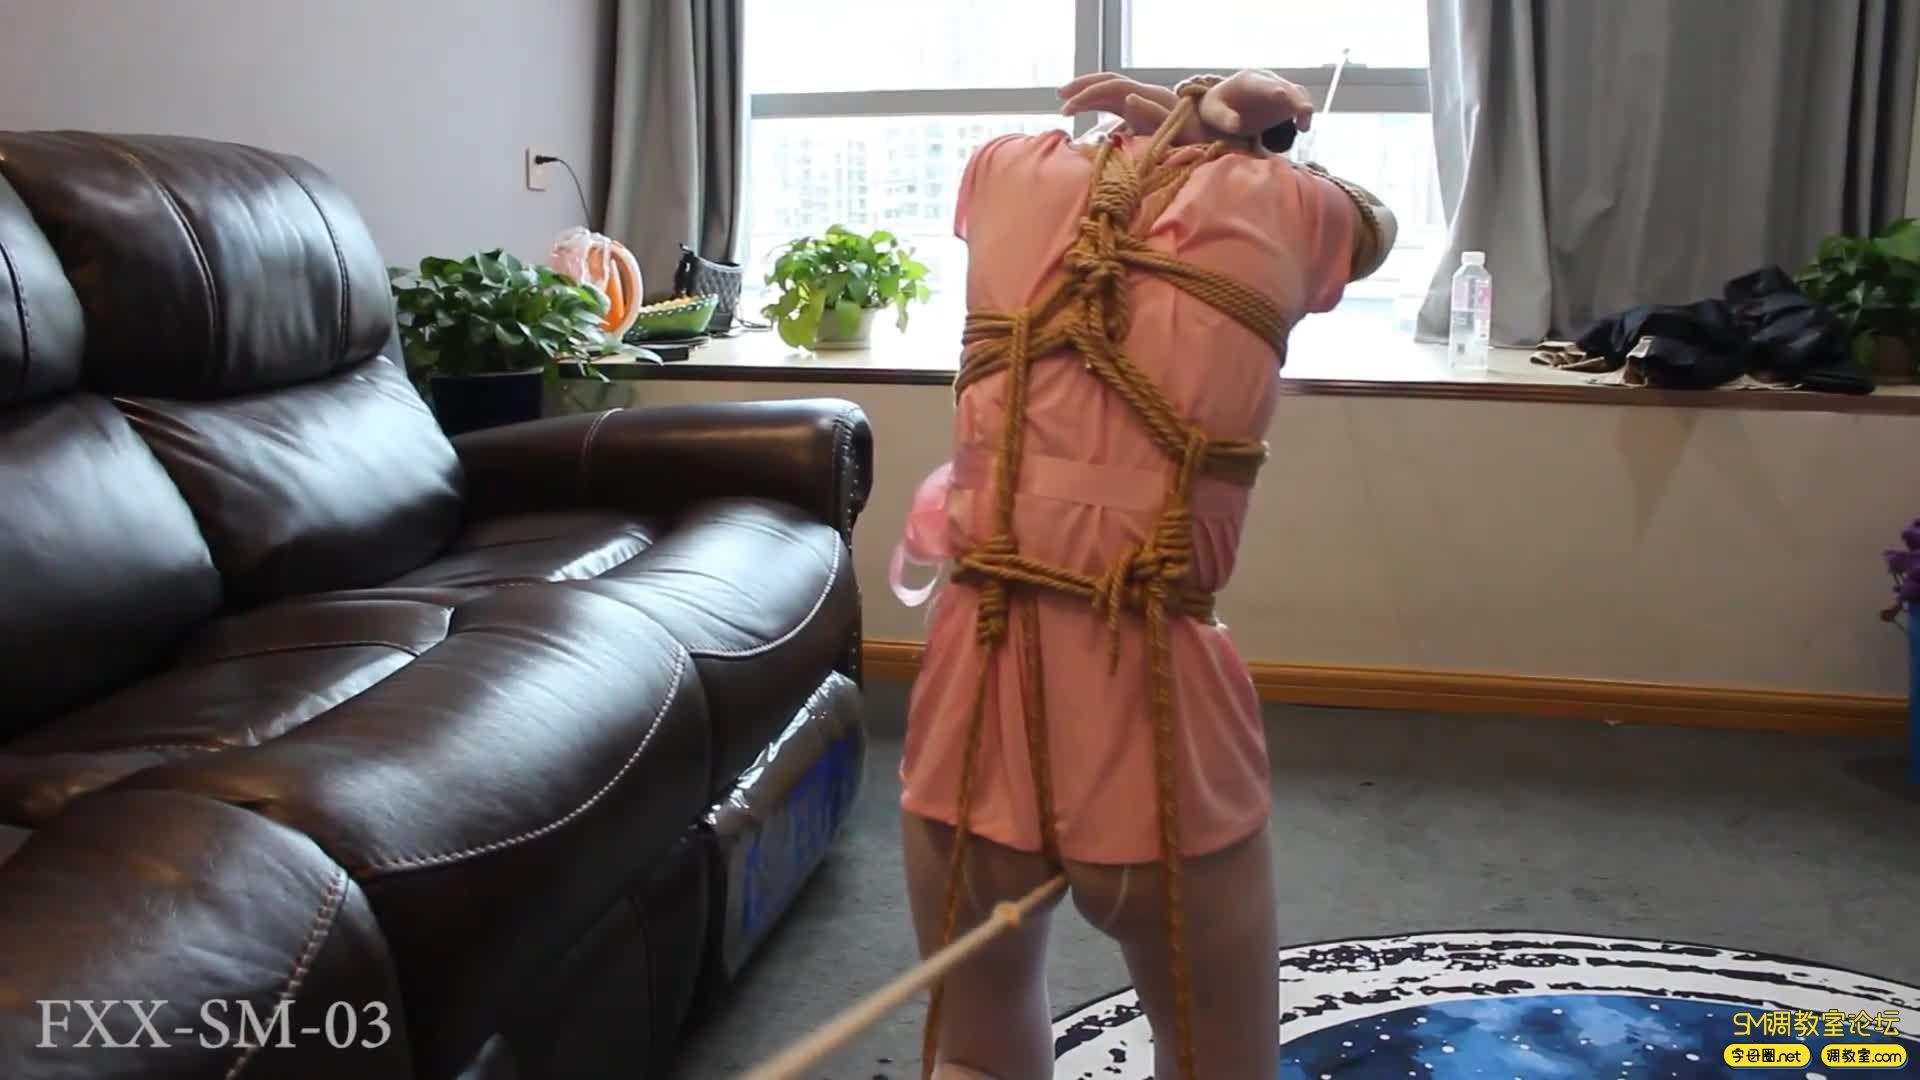 【FXX】走绳这种酷刑 站着走是不是有点对酷刑二字不大尊重?-视频截图3